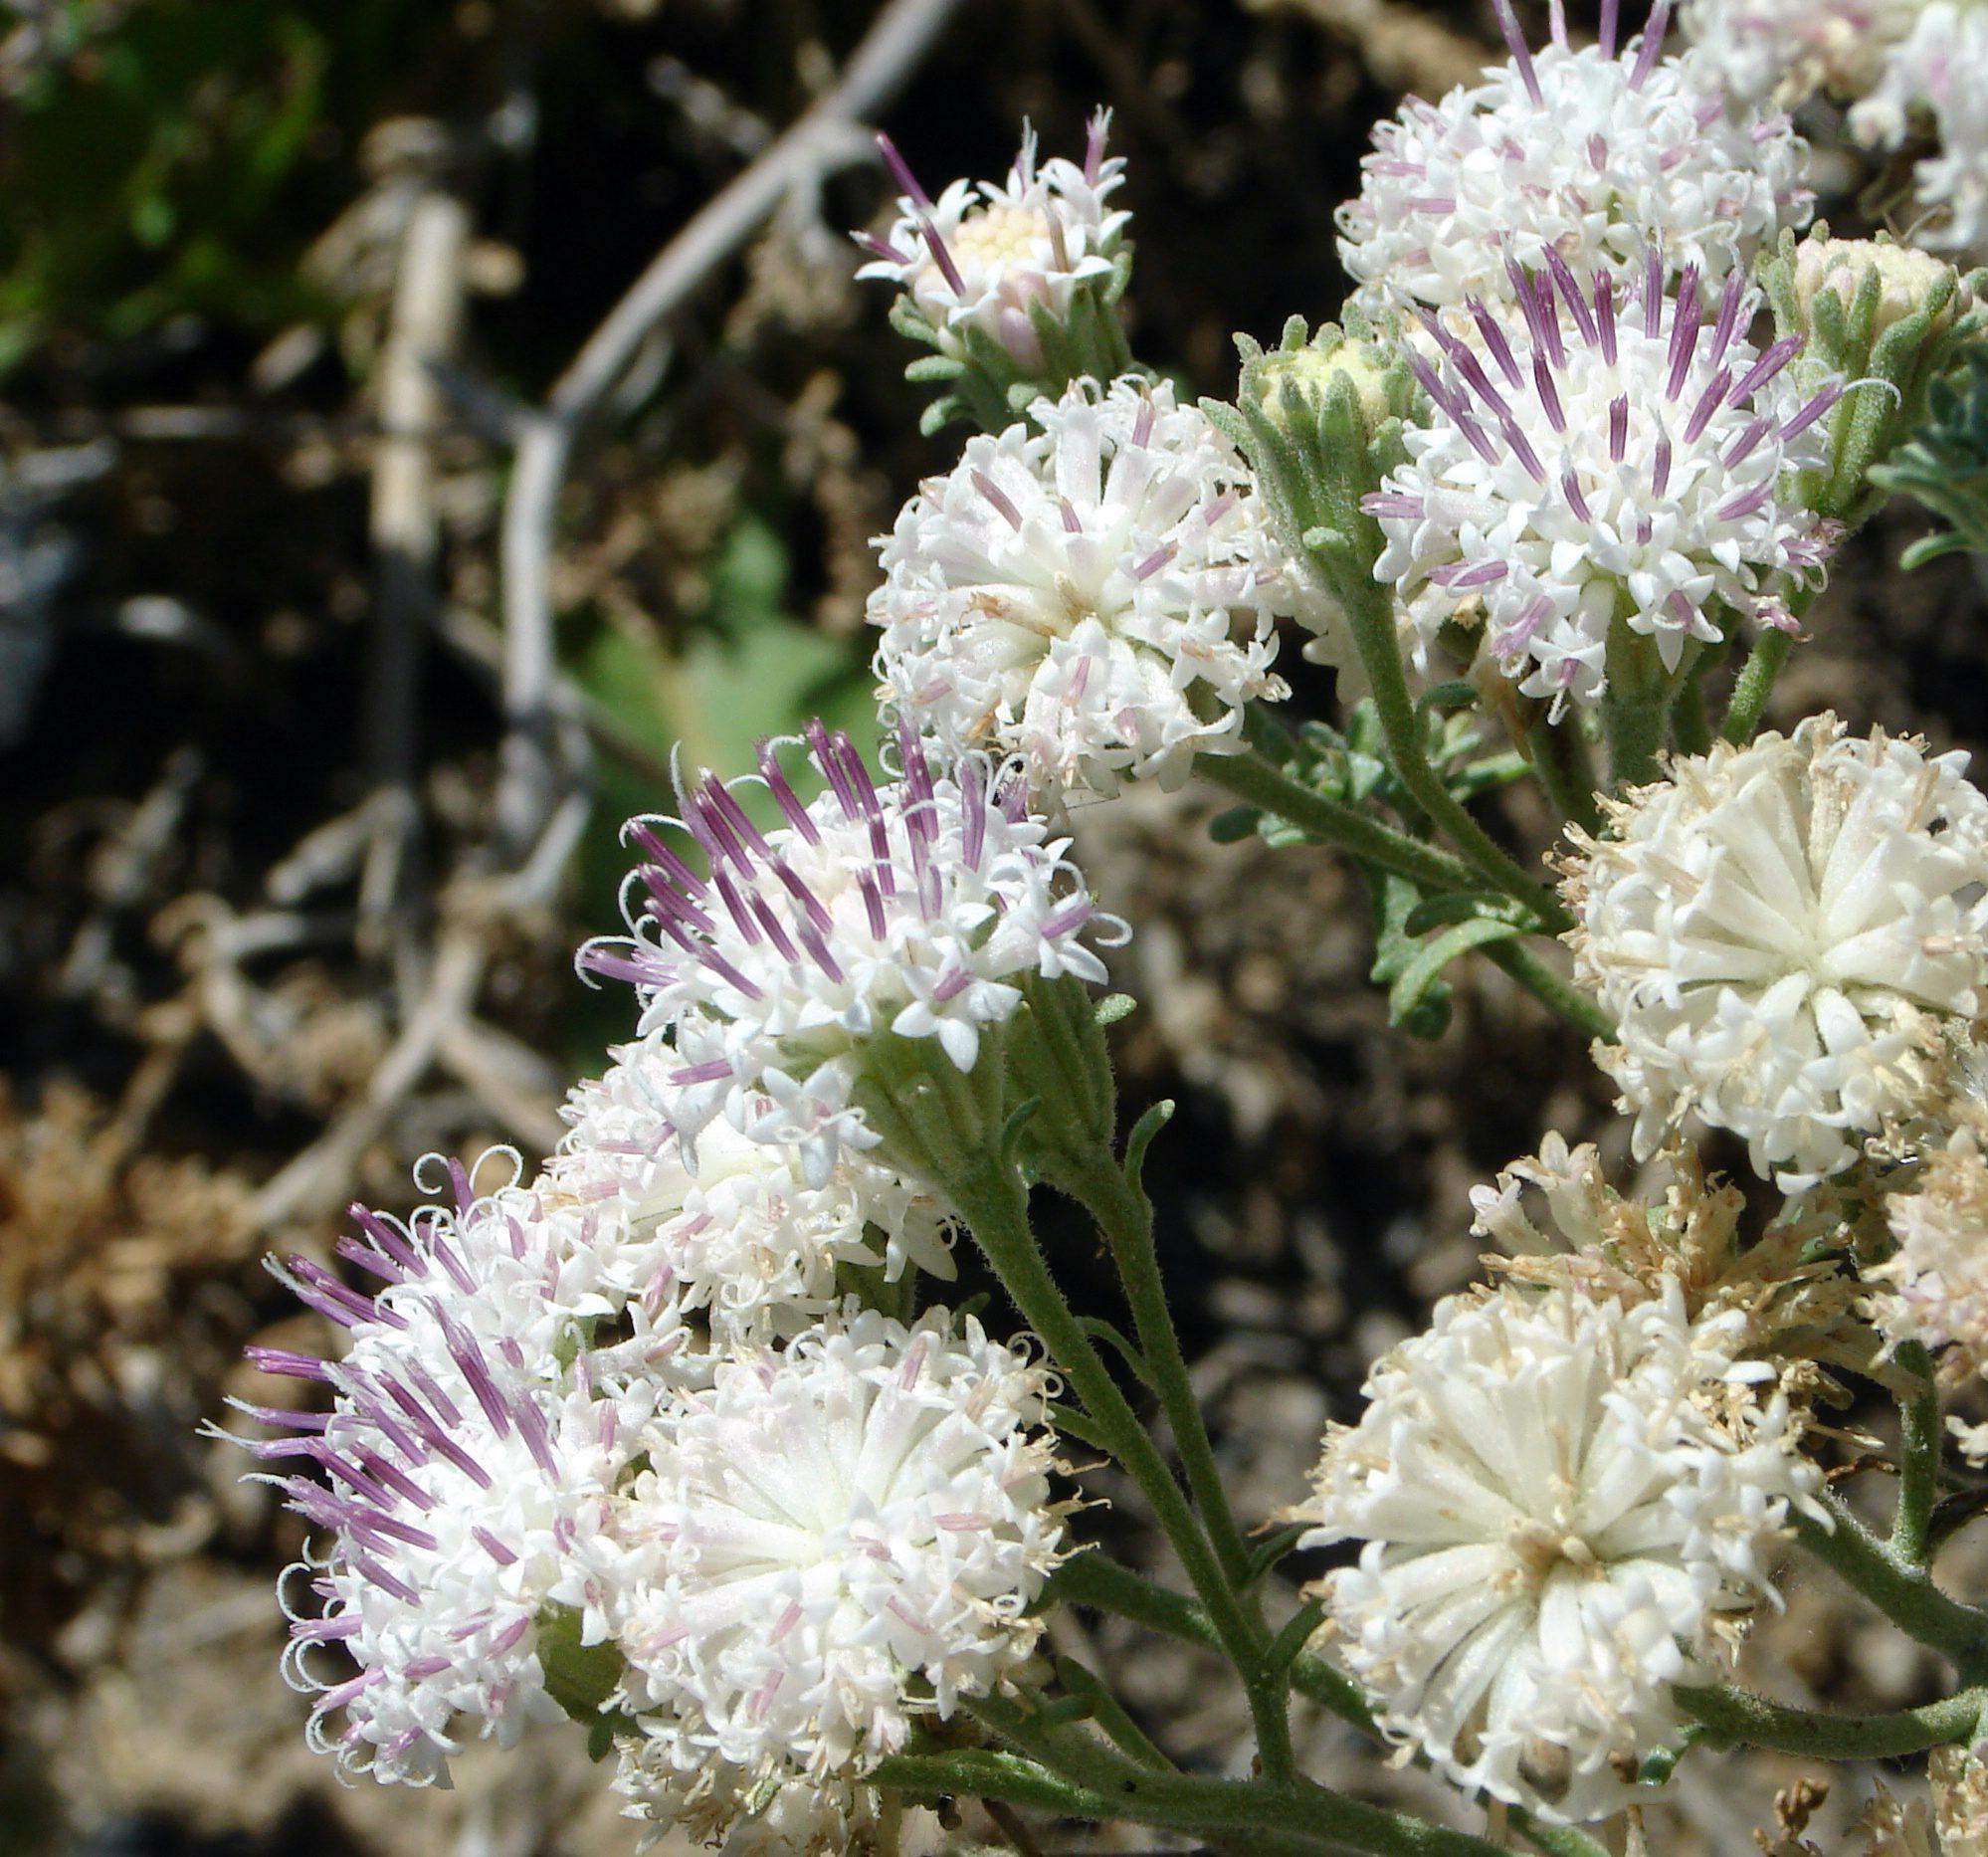 Chaenactis douglasii flowers, not a rare plant